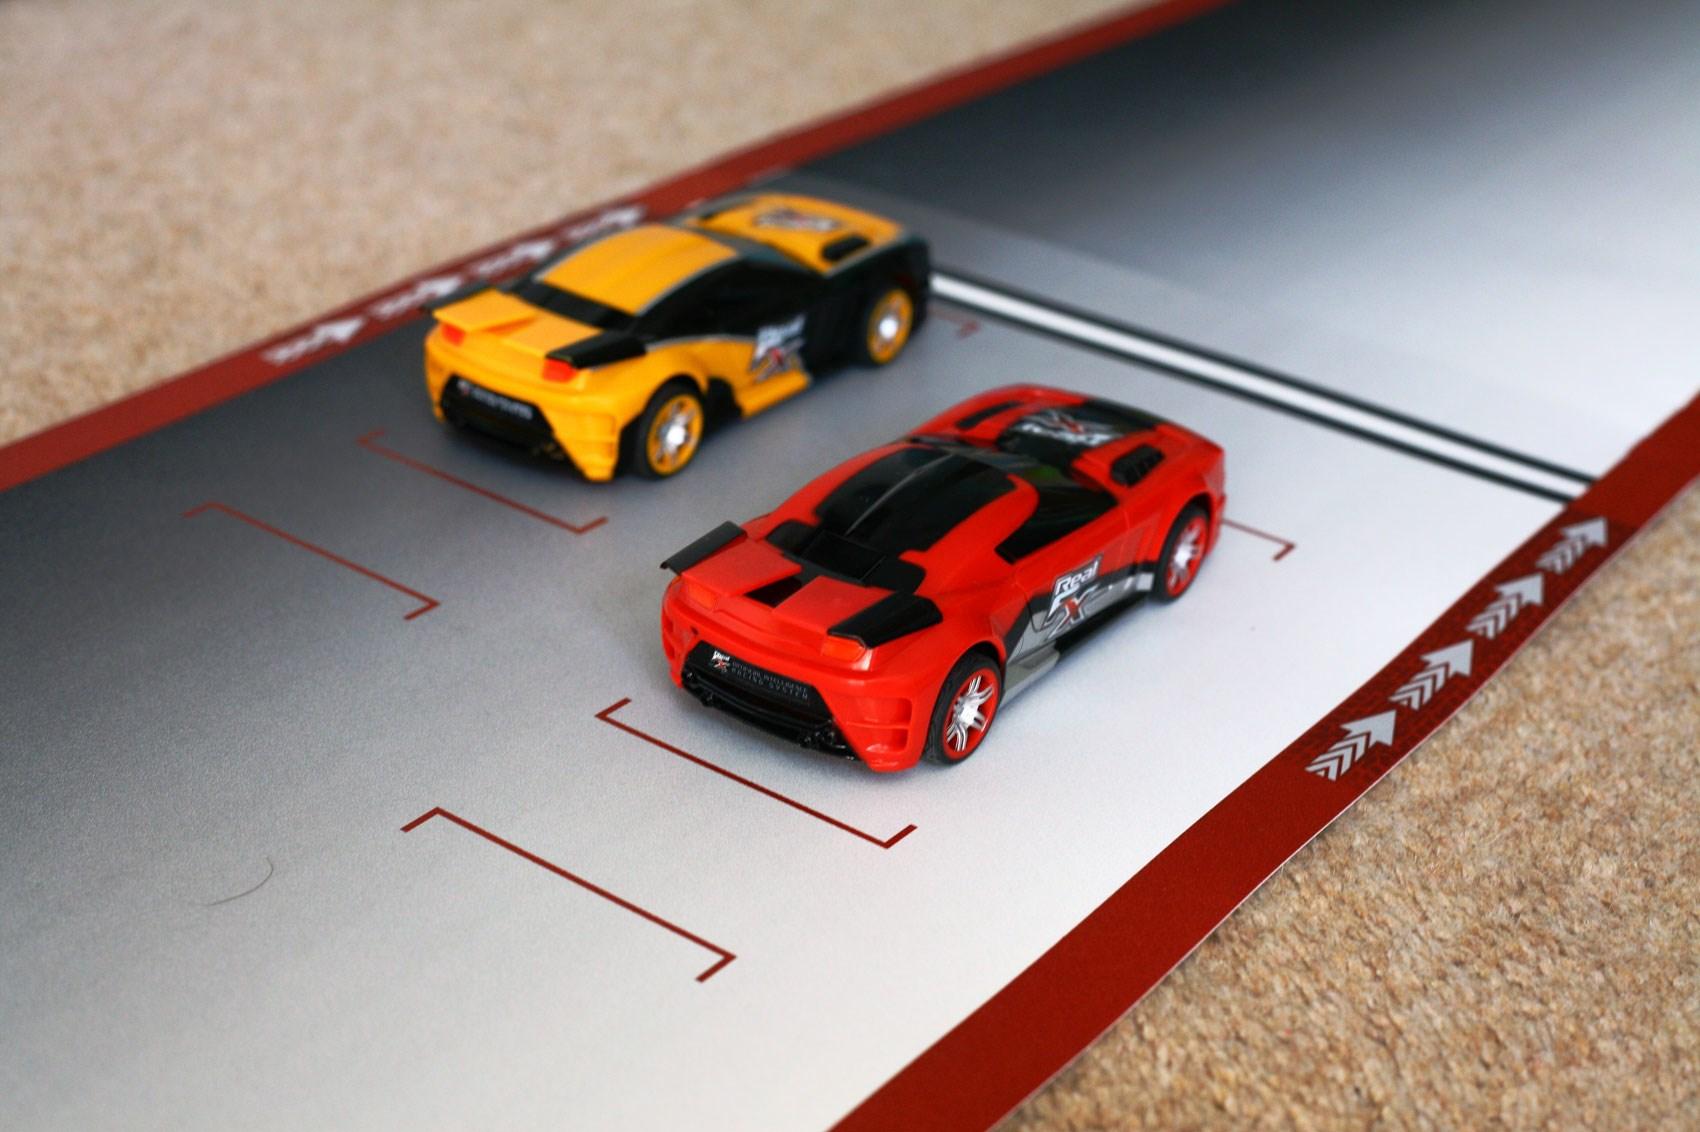 Slot Car Tracks for Racing - Reviews on Bestadvisor.com